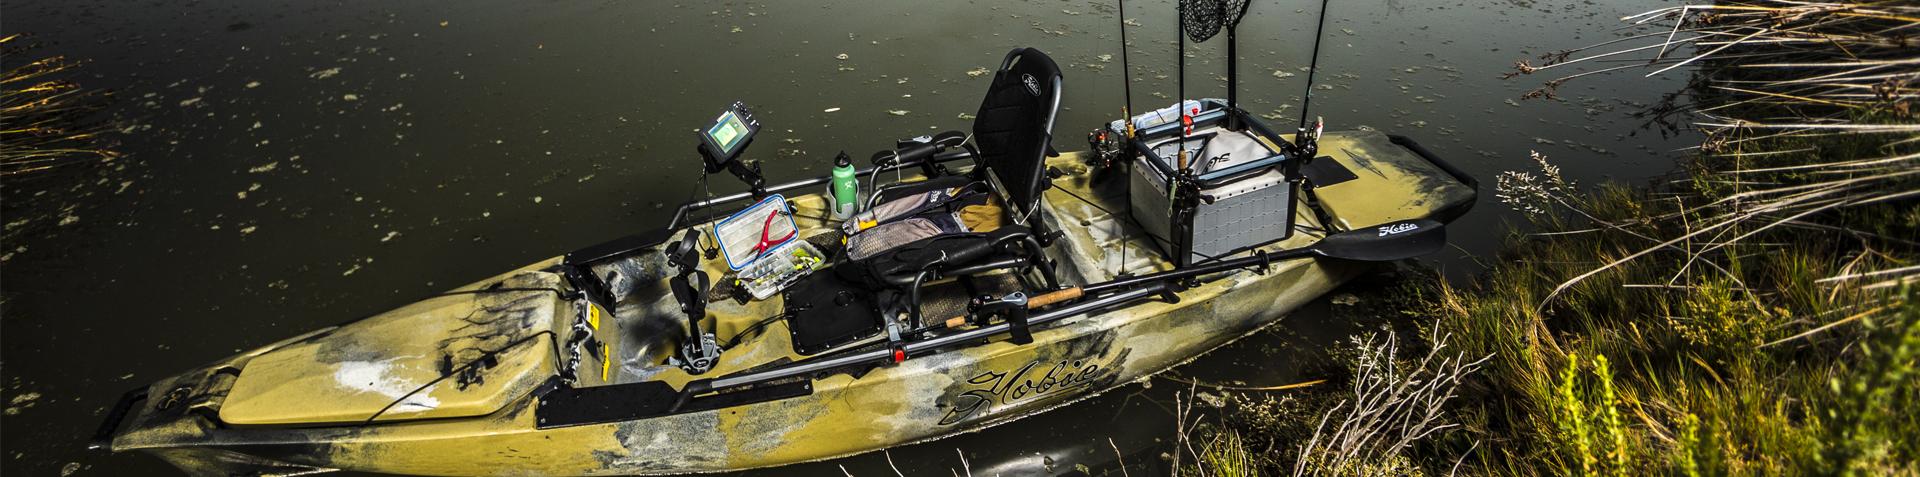 Kayaks: Mirage Pro Angler 14 by Hobie - Image 2690